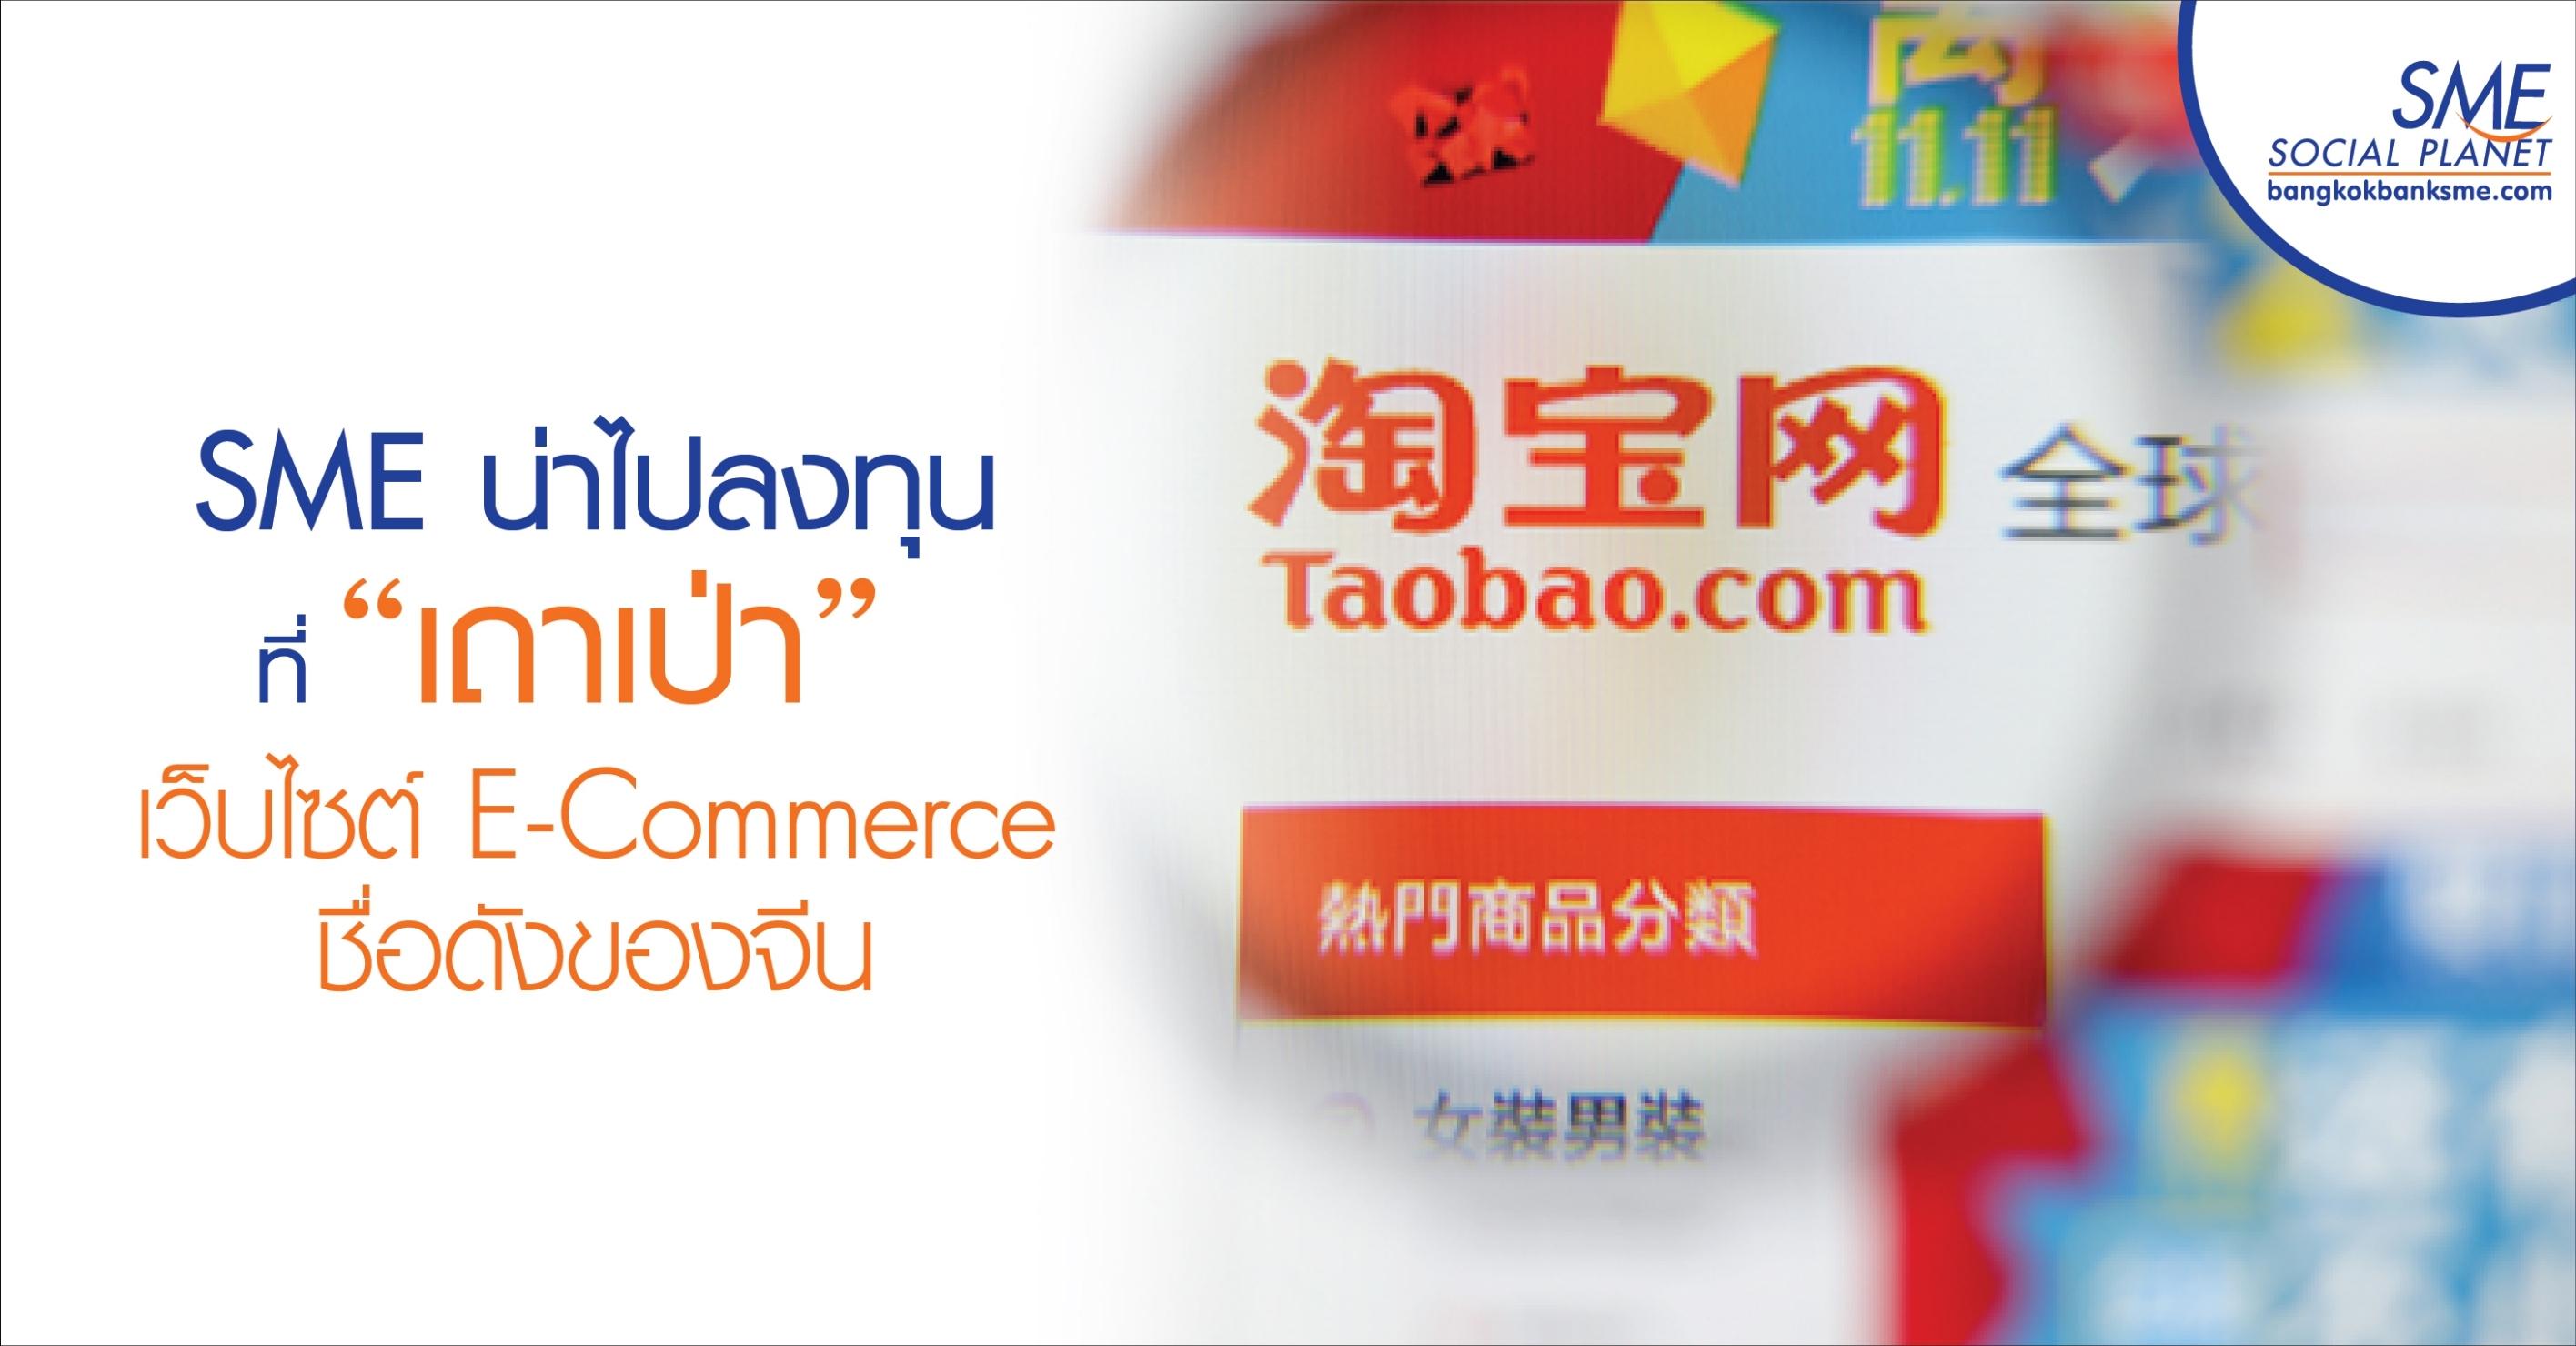 "SME น่าไปลงทุนที่ ""เถาเป่า"" เว็บไซต์ E-Commerce ชื่อดังของจีน"